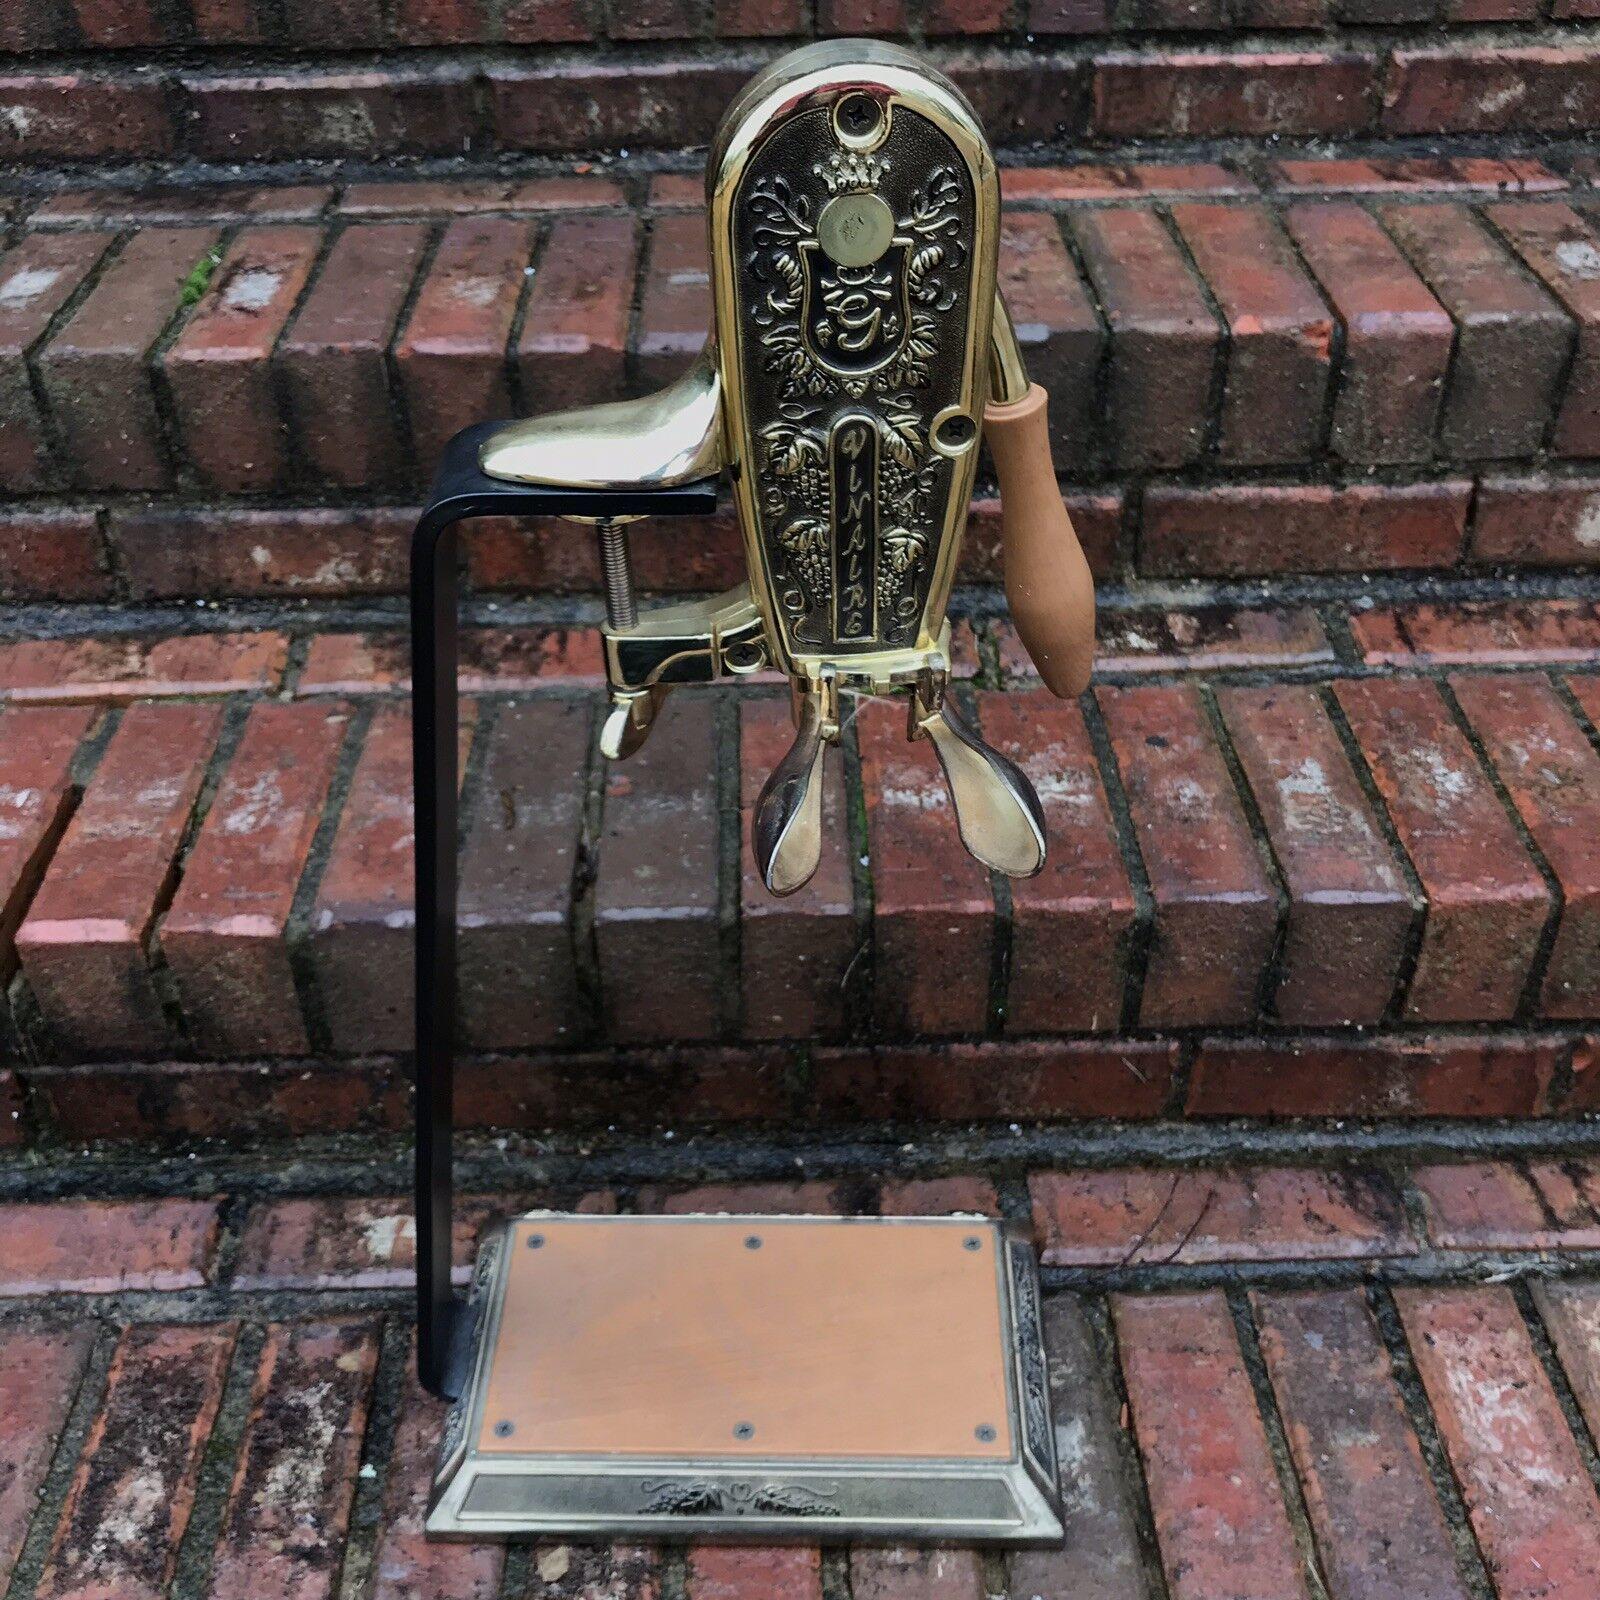 Vinaire Wine Bottle Opener Lever Arm Crank Corkscrew Bar Stand Restaurant Brass